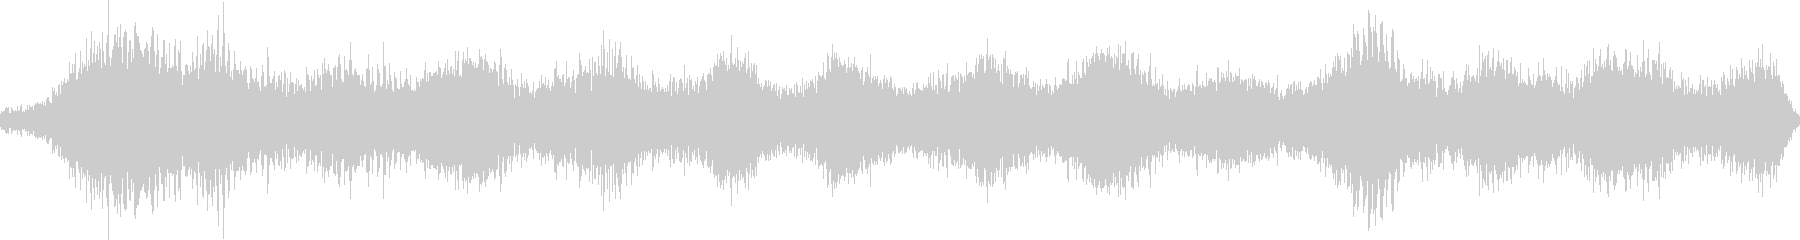 X Sounds 1301 ZGの未再生の波形